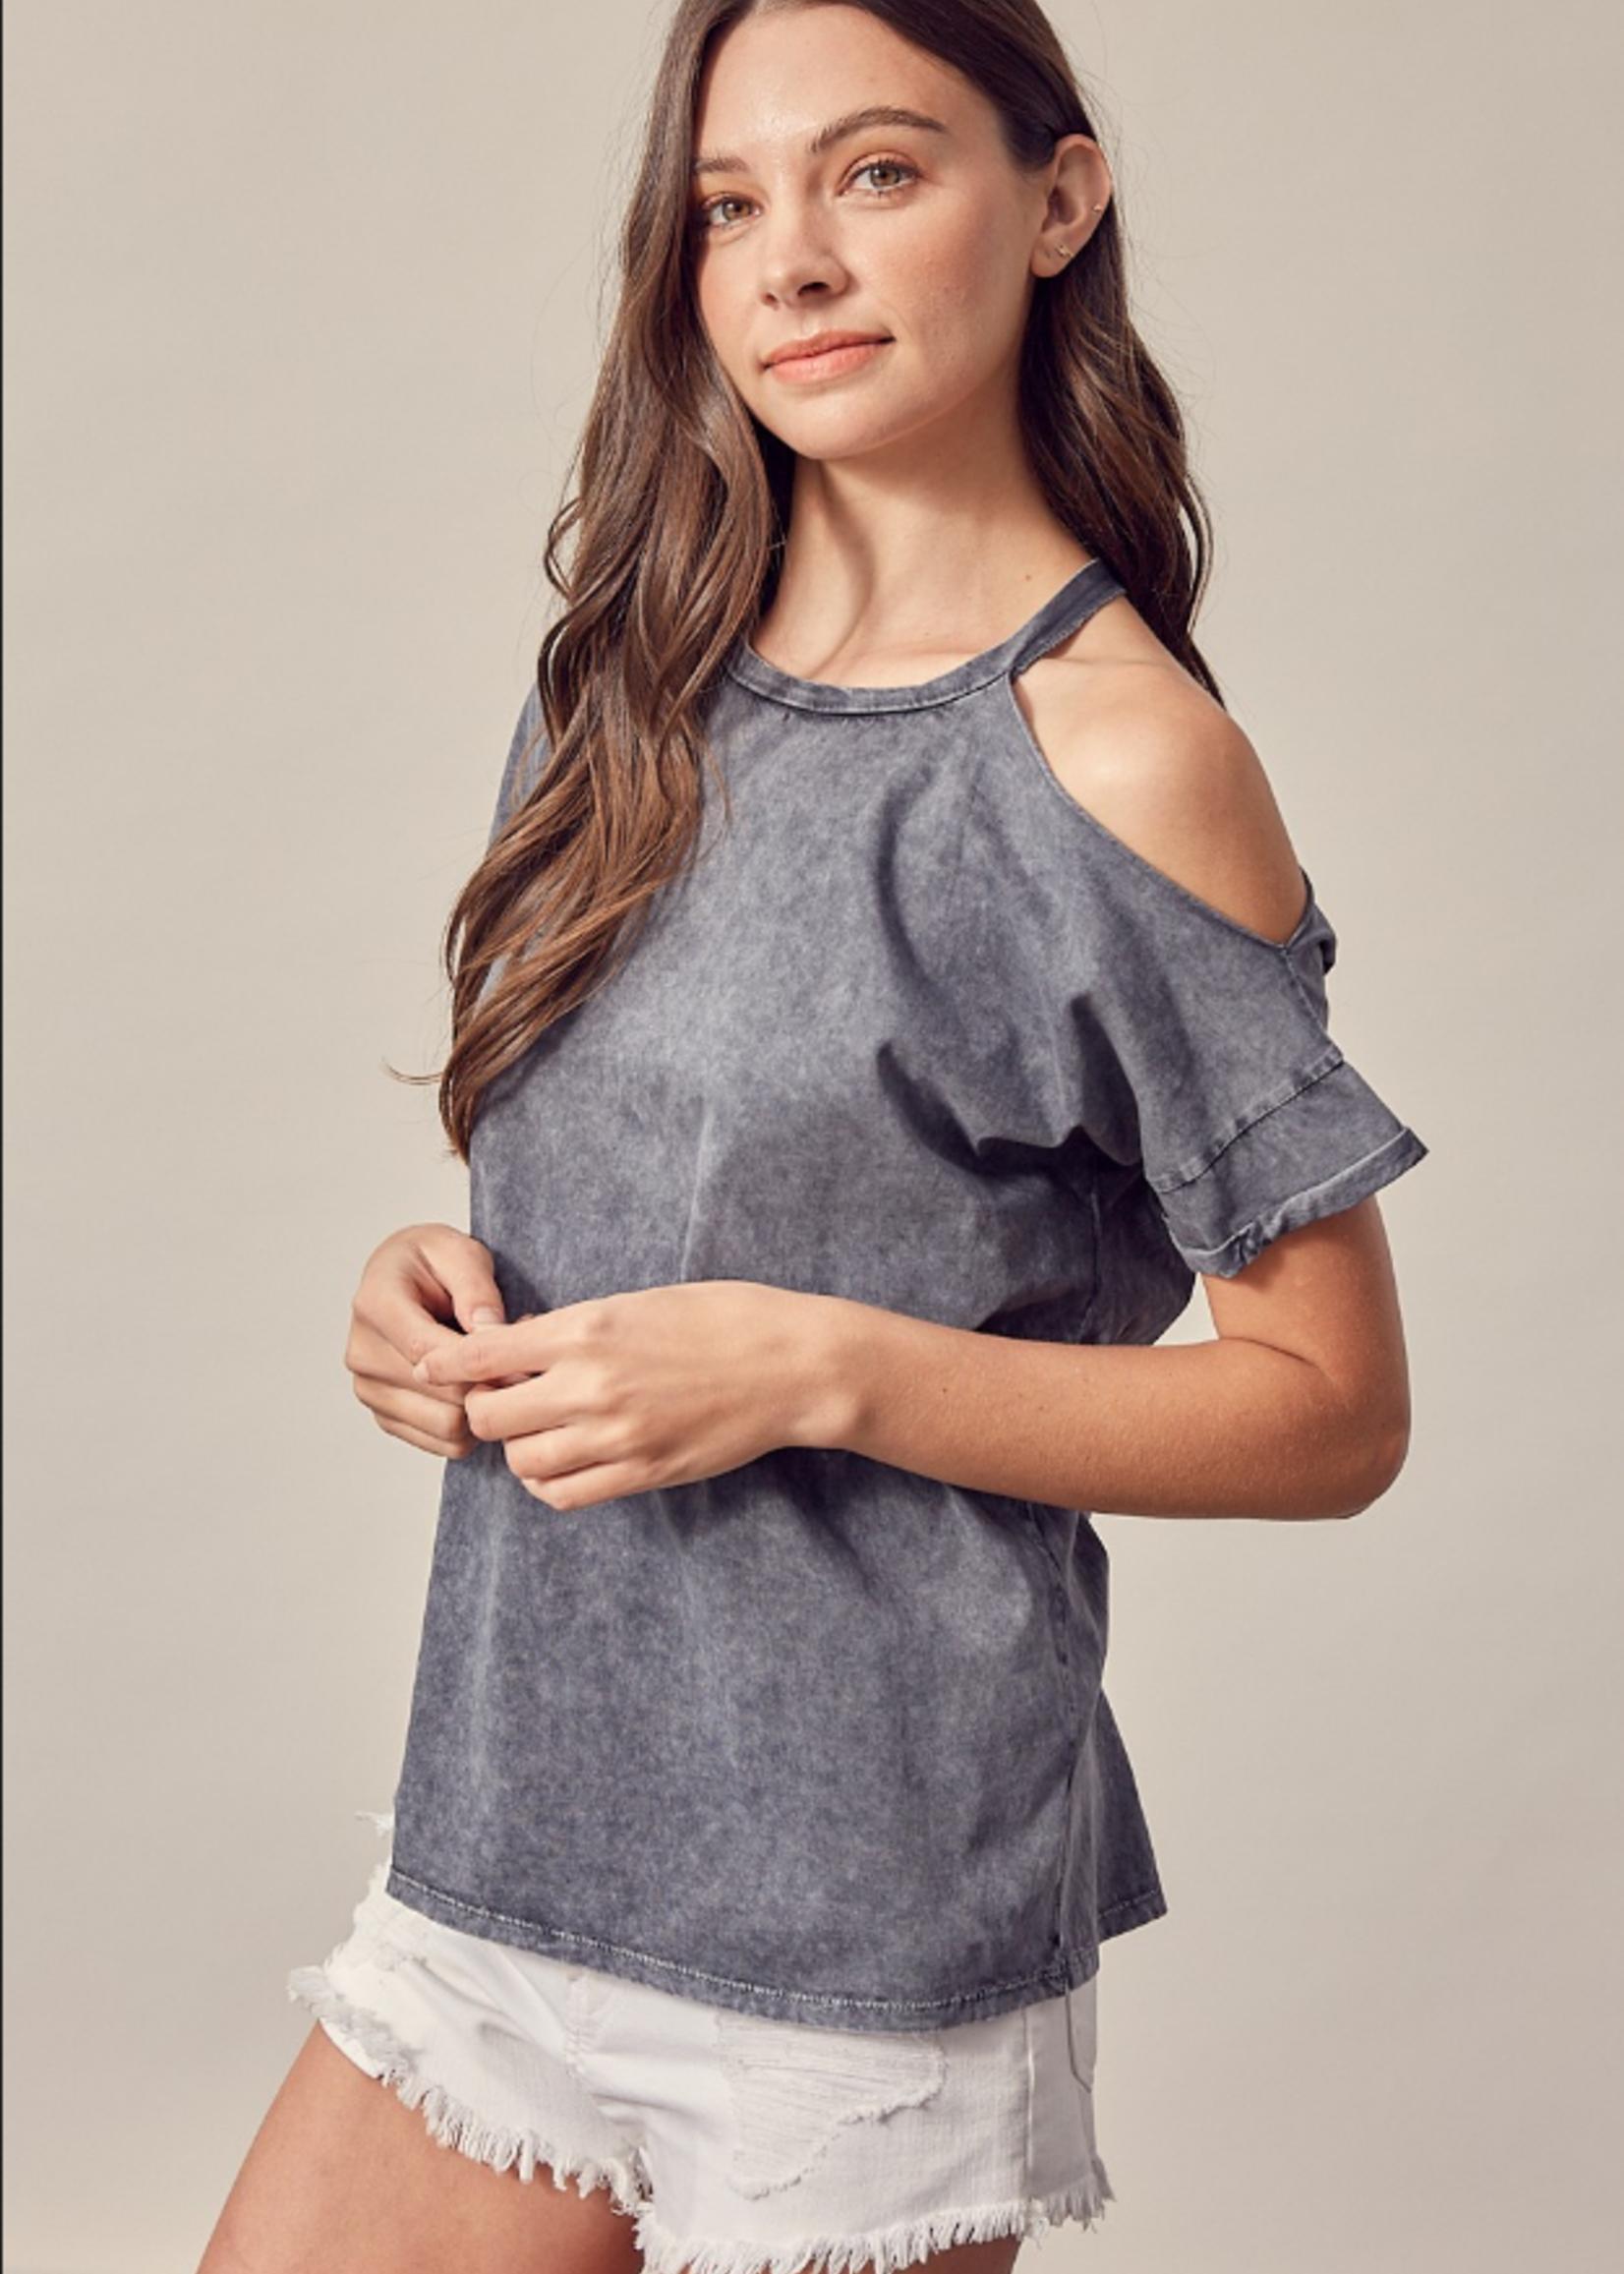 One Open Shoulder Top - Ashed Grey